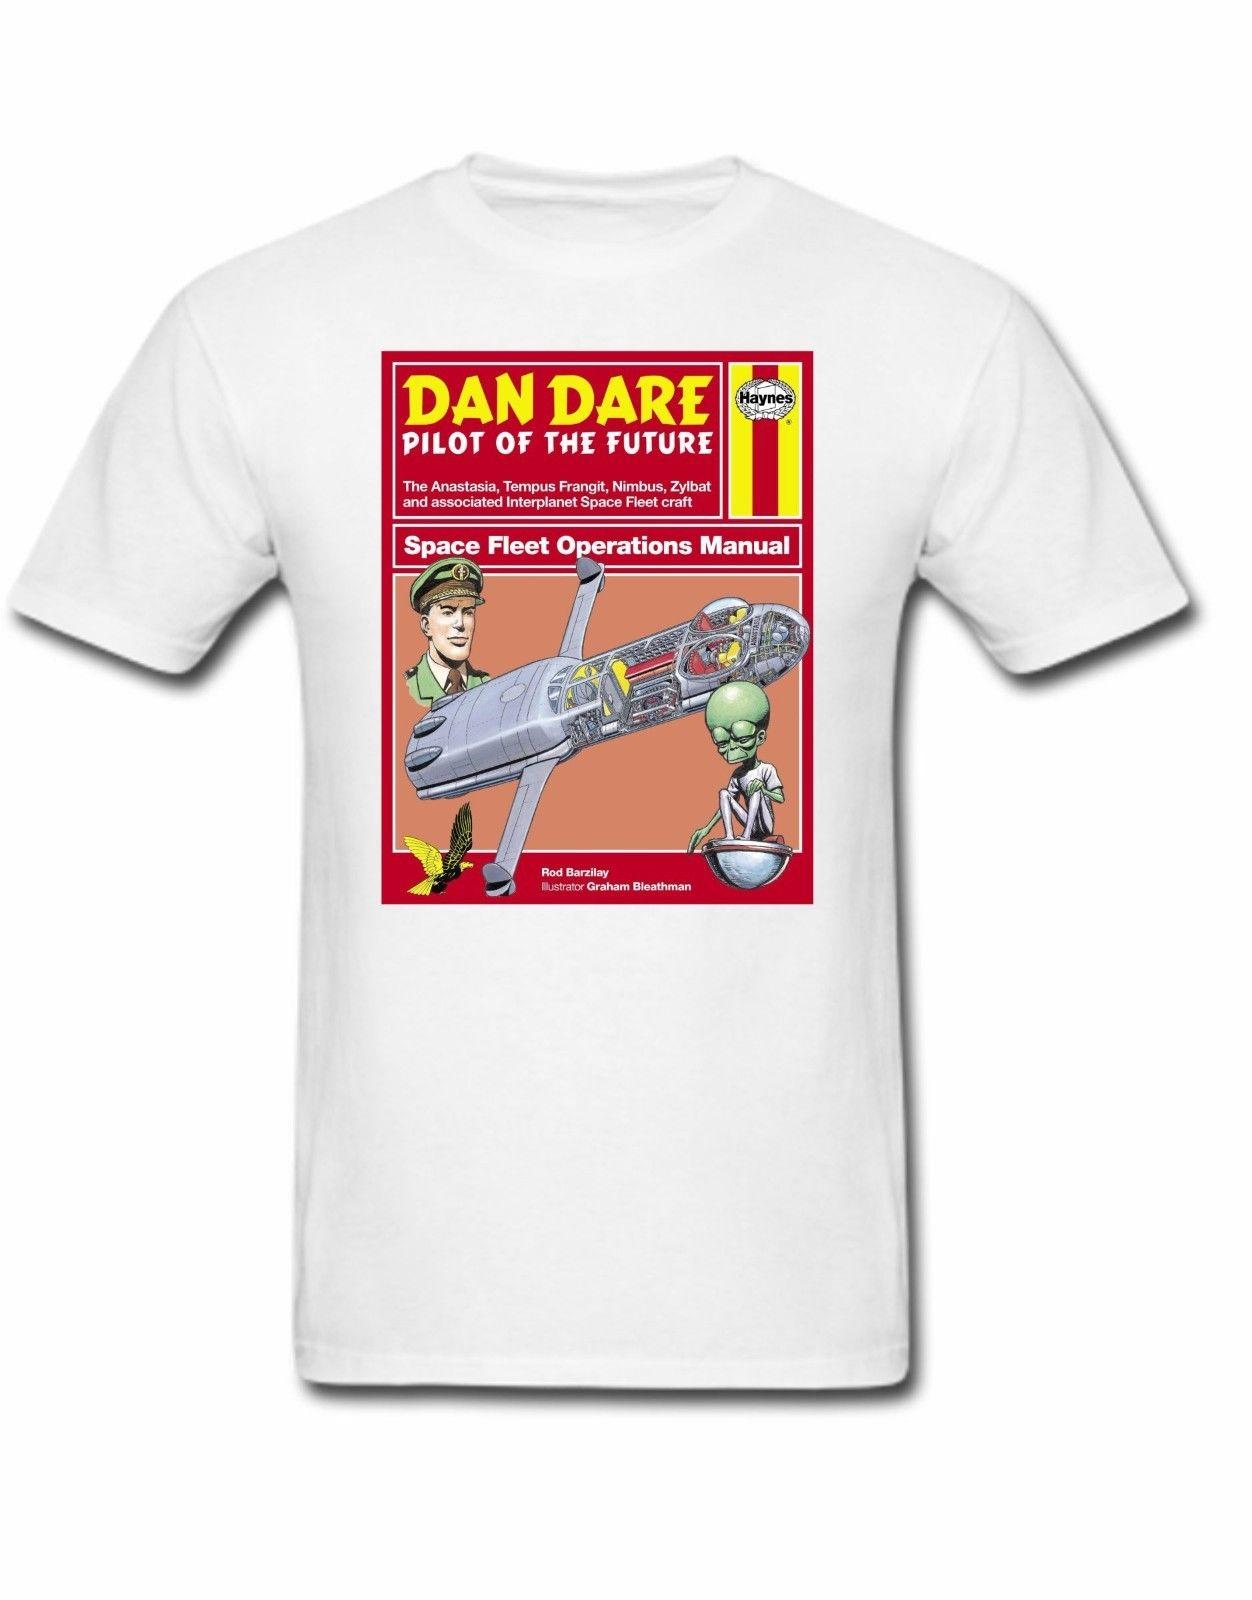 US $11 45 18% OFF|Dan Dare T shirt Haynes manual 50s 60s 70s 80s 90s 00s  space mekon pilot earth Cool Casual pride t shirt men Unisex New Fashion-in